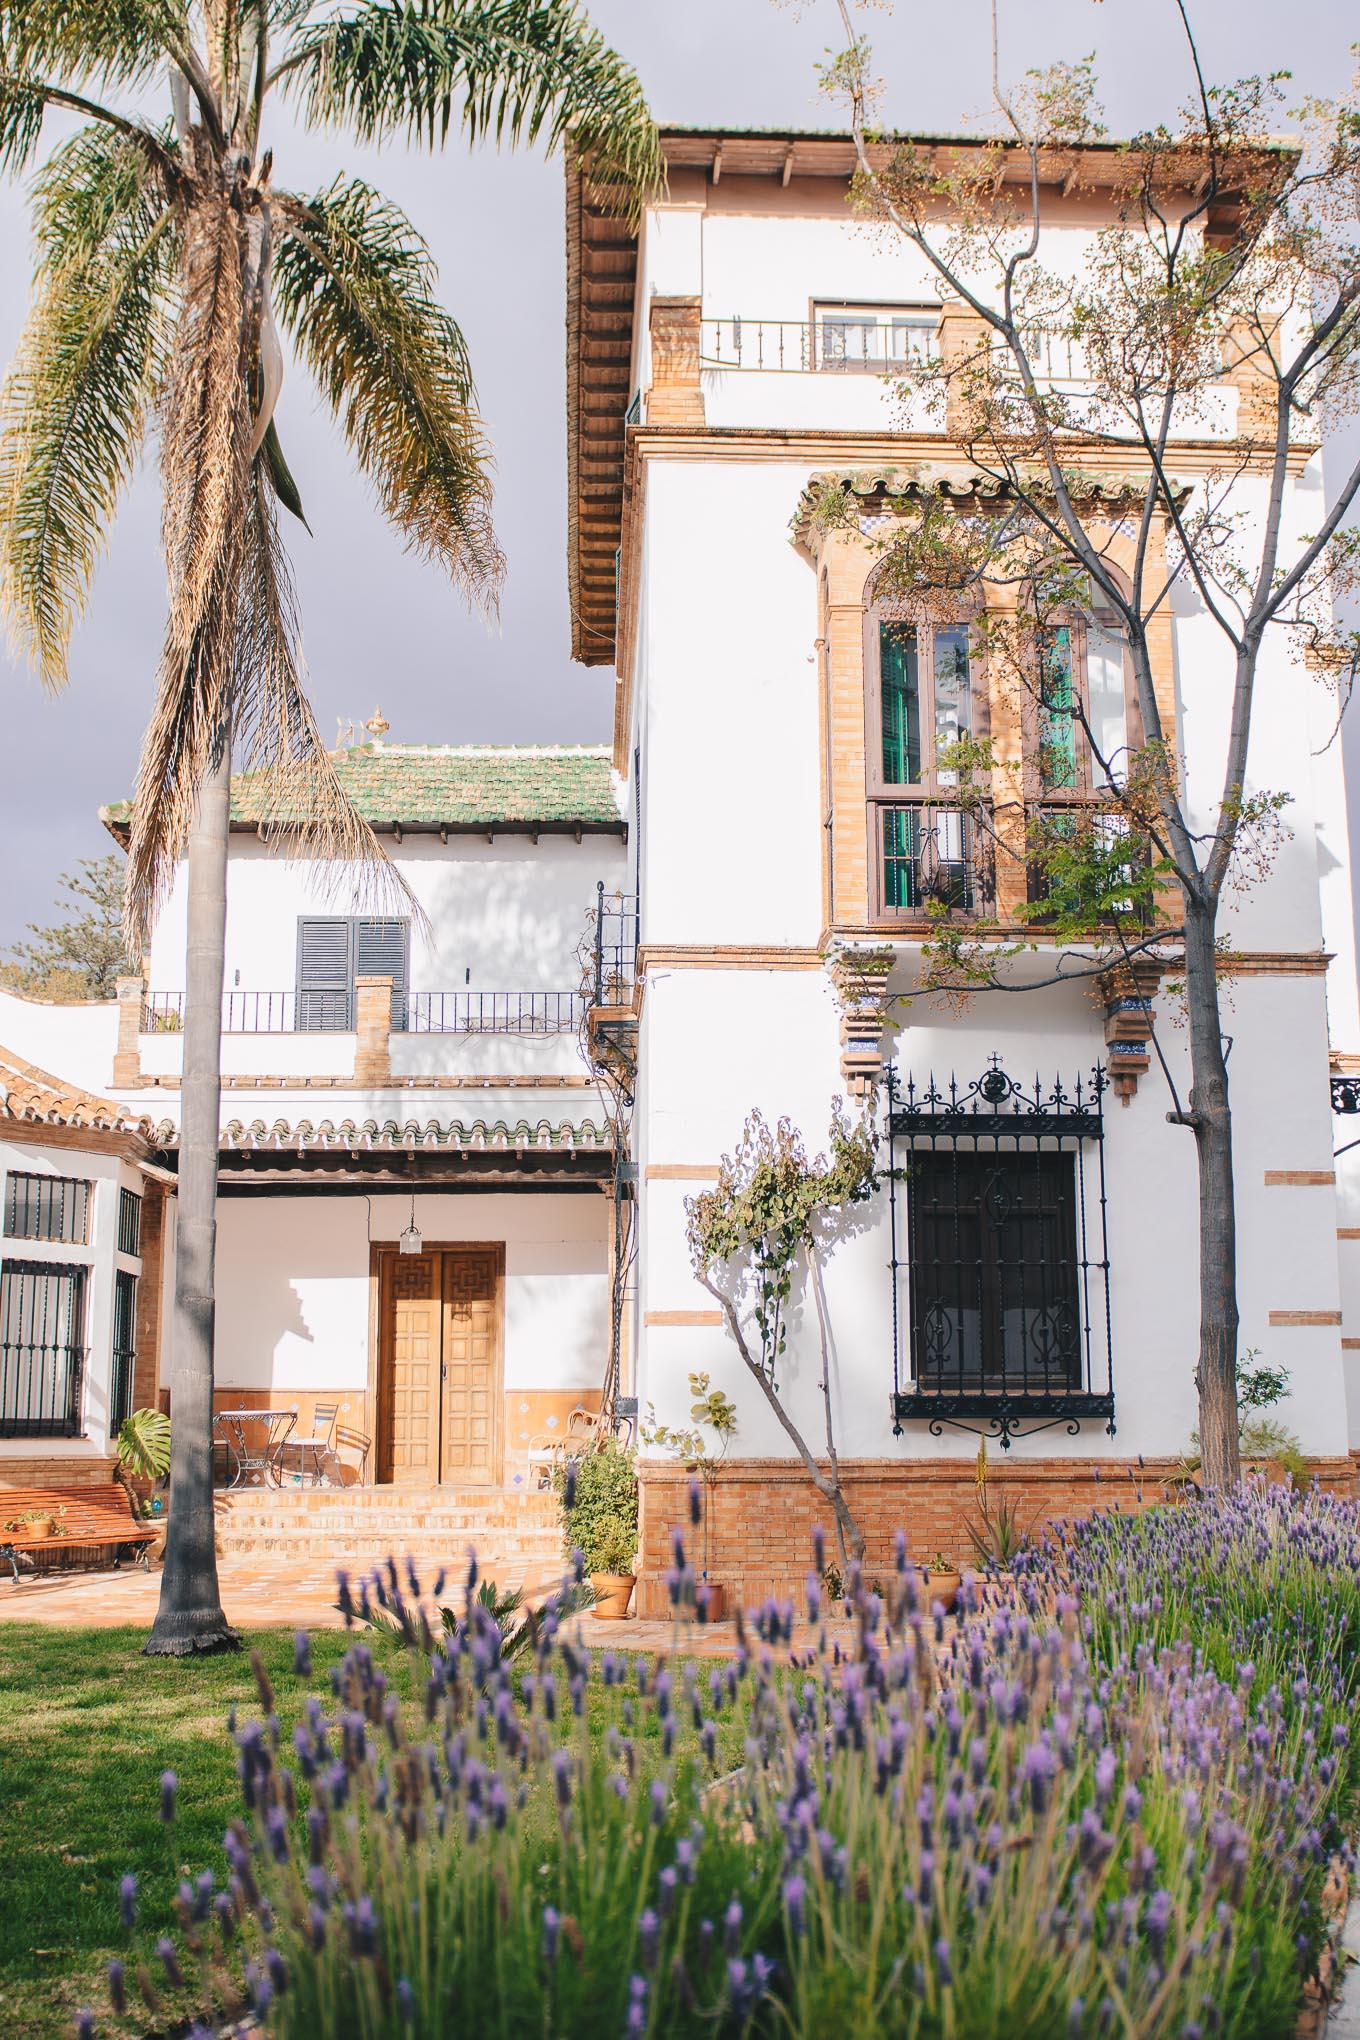 Villa Elisa Malaga travel guide